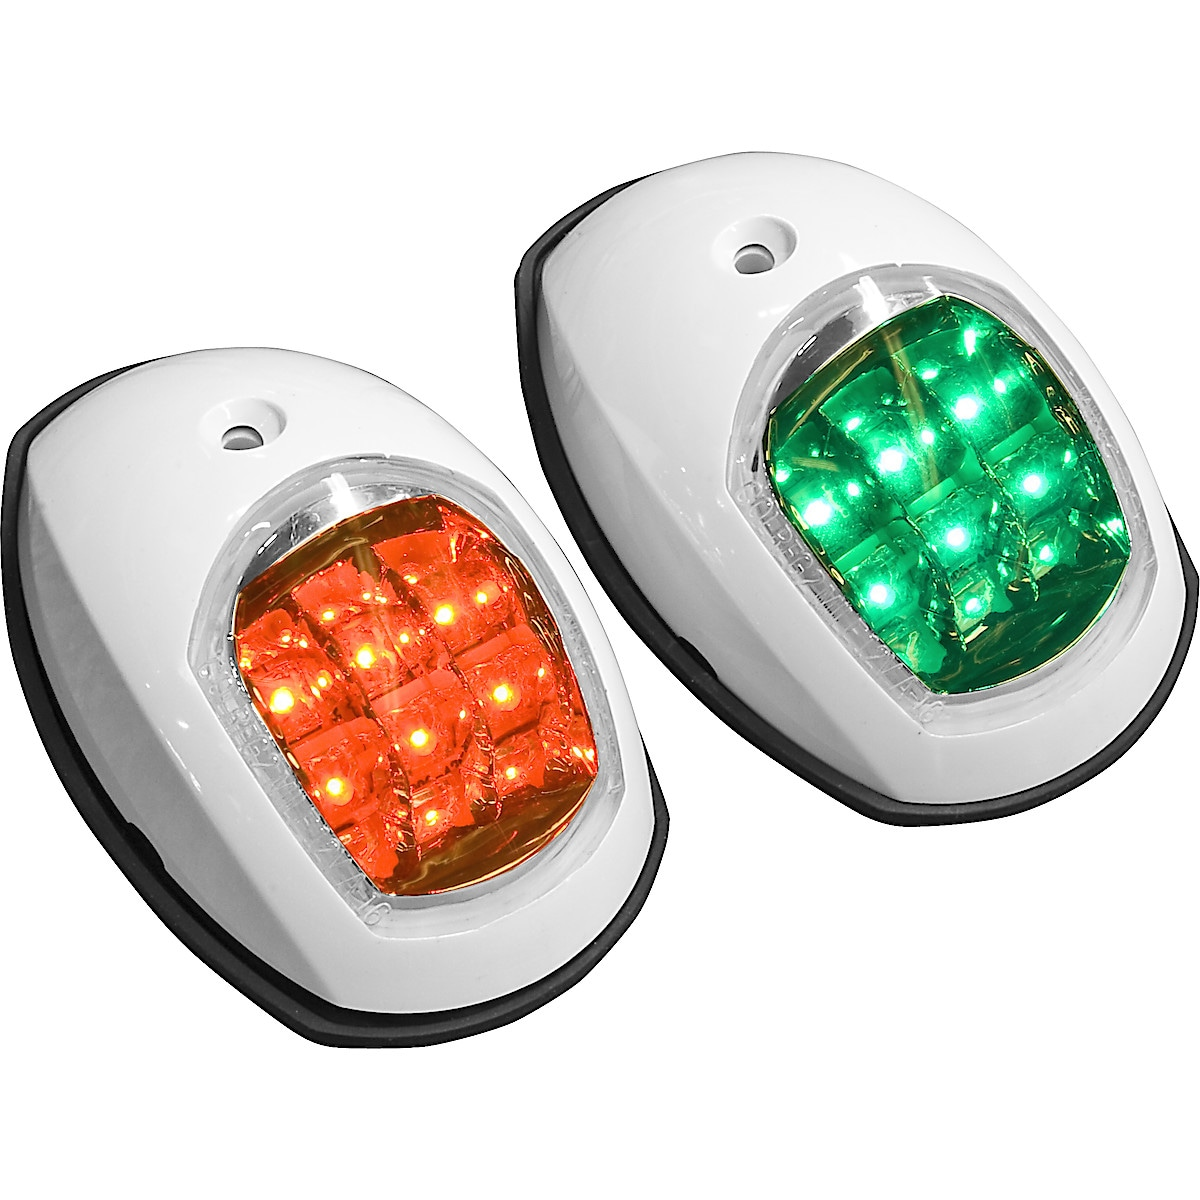 LED-lanternasats styrbord/babord